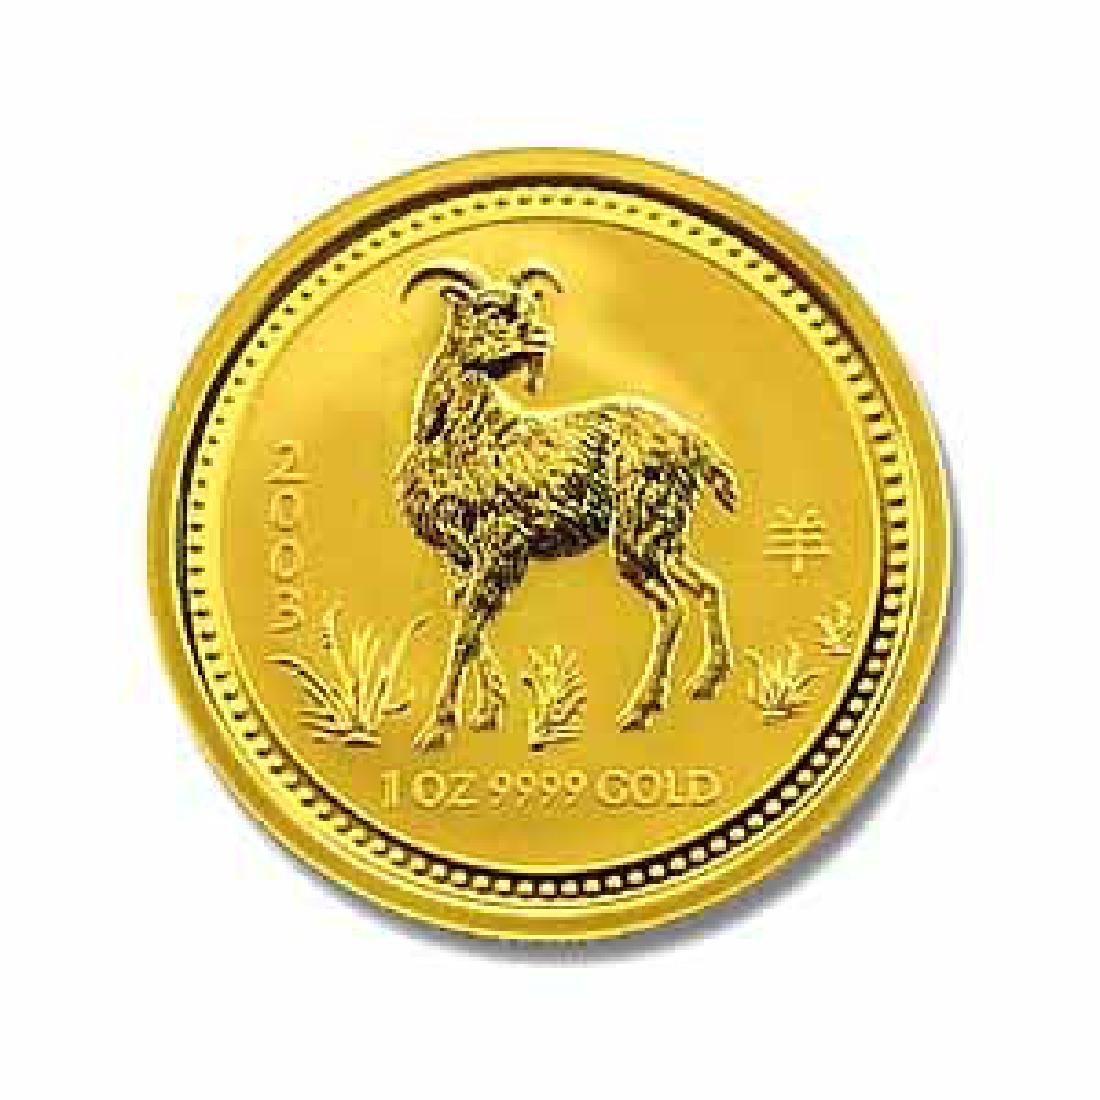 2003 Australia 1 oz Gold Lunar Goat